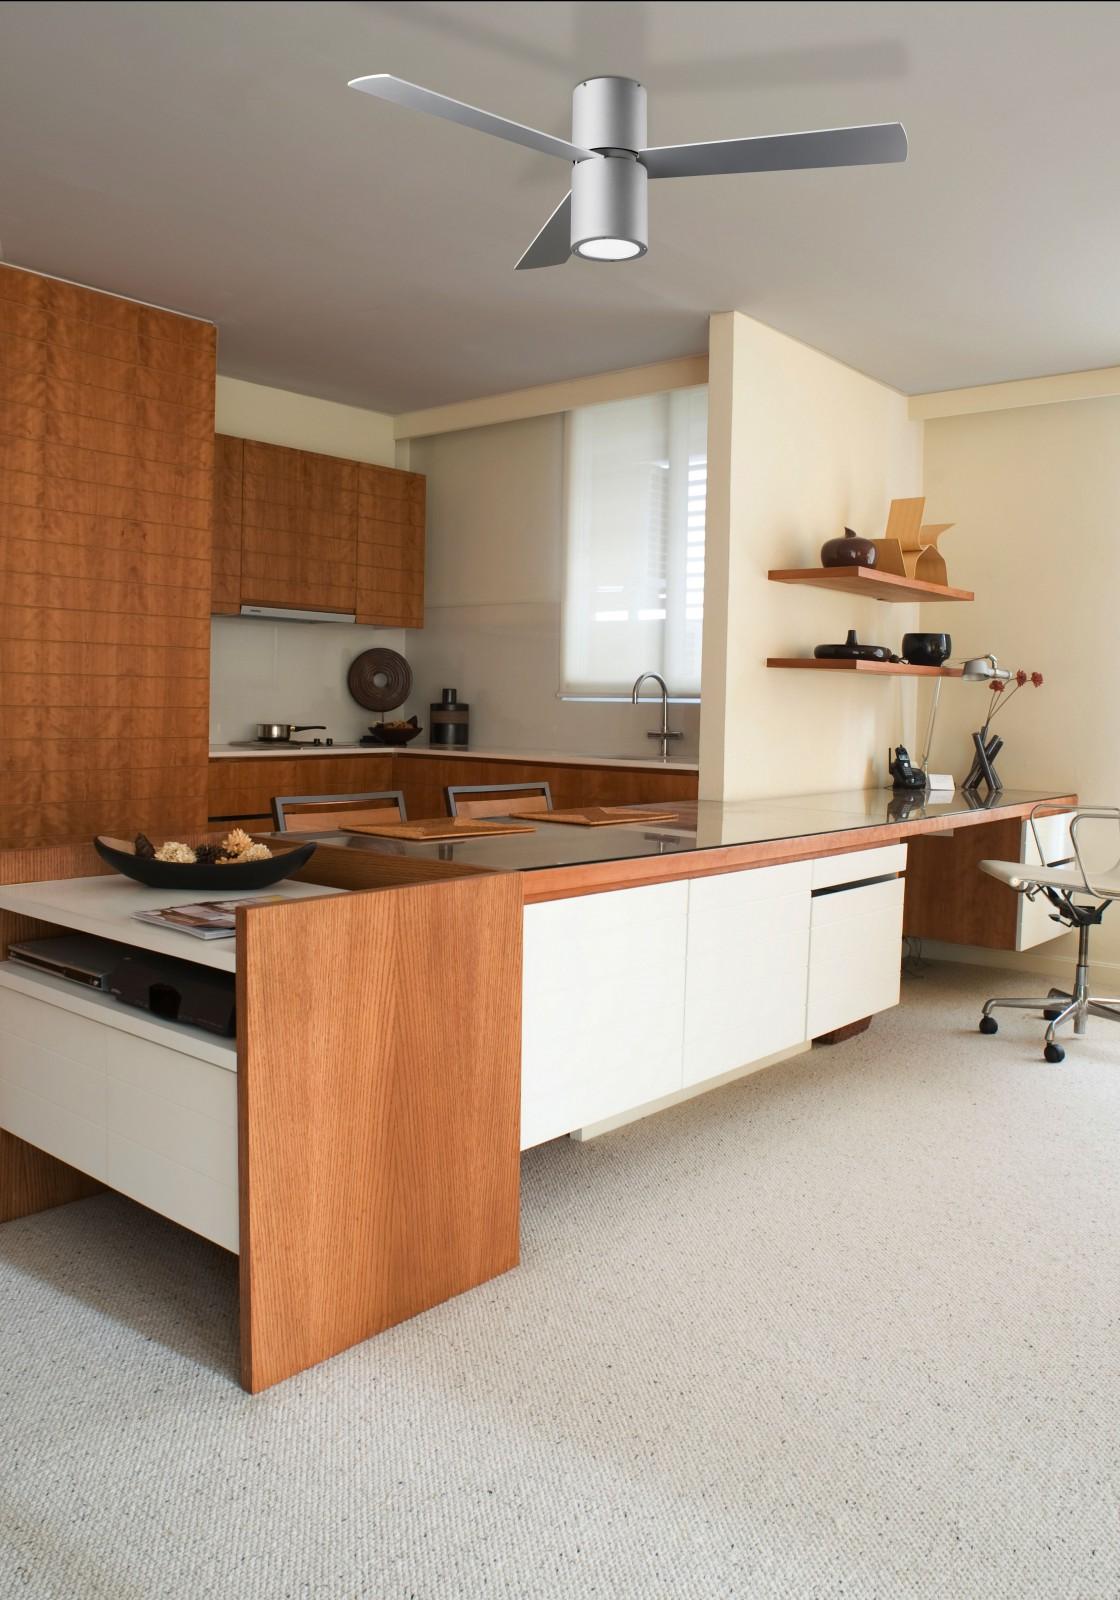 design deckenventilator formentera grau mit led 132 cm. Black Bedroom Furniture Sets. Home Design Ideas